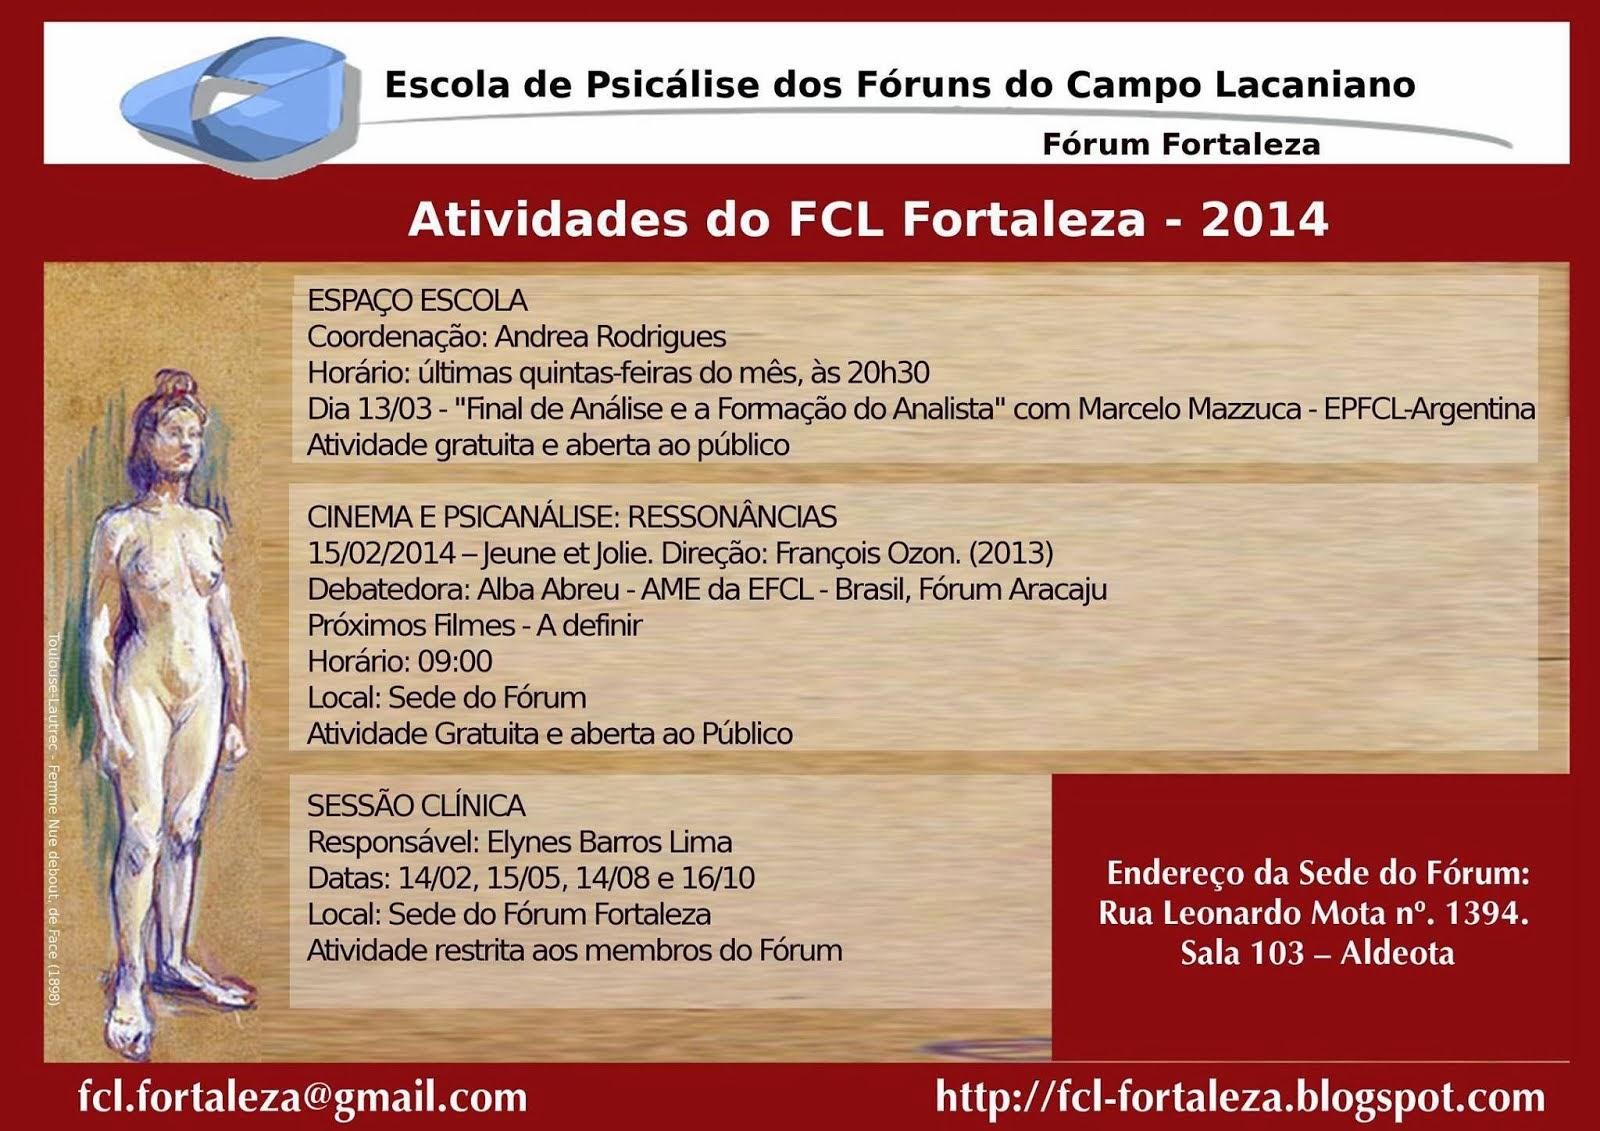 ATIVIDADES DO FCL FORTALEZA